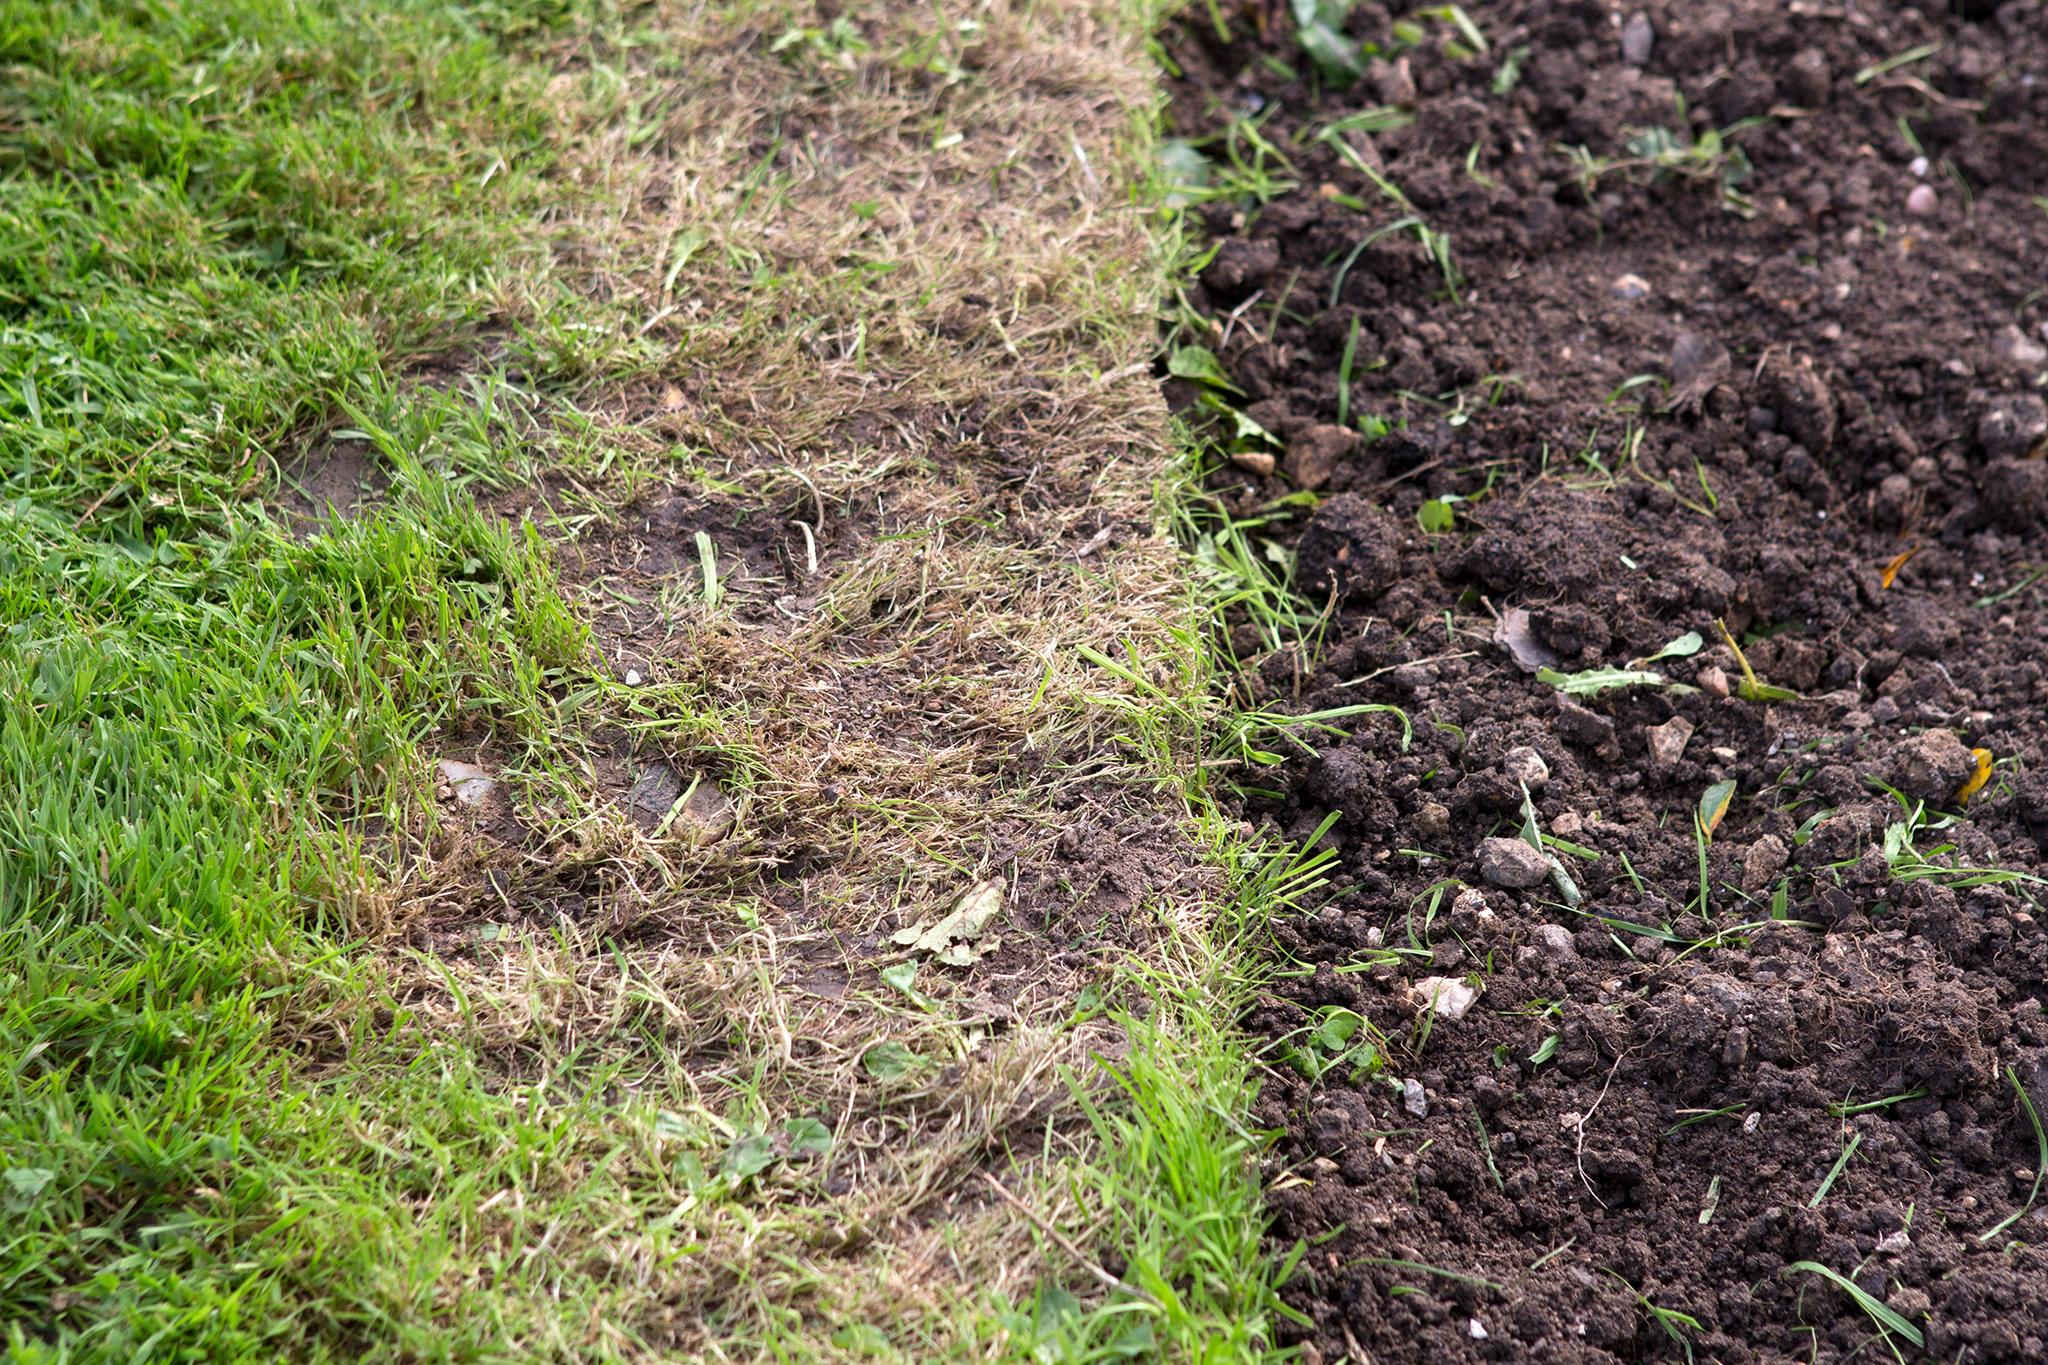 area-of-turf-that-needs-repairing-3